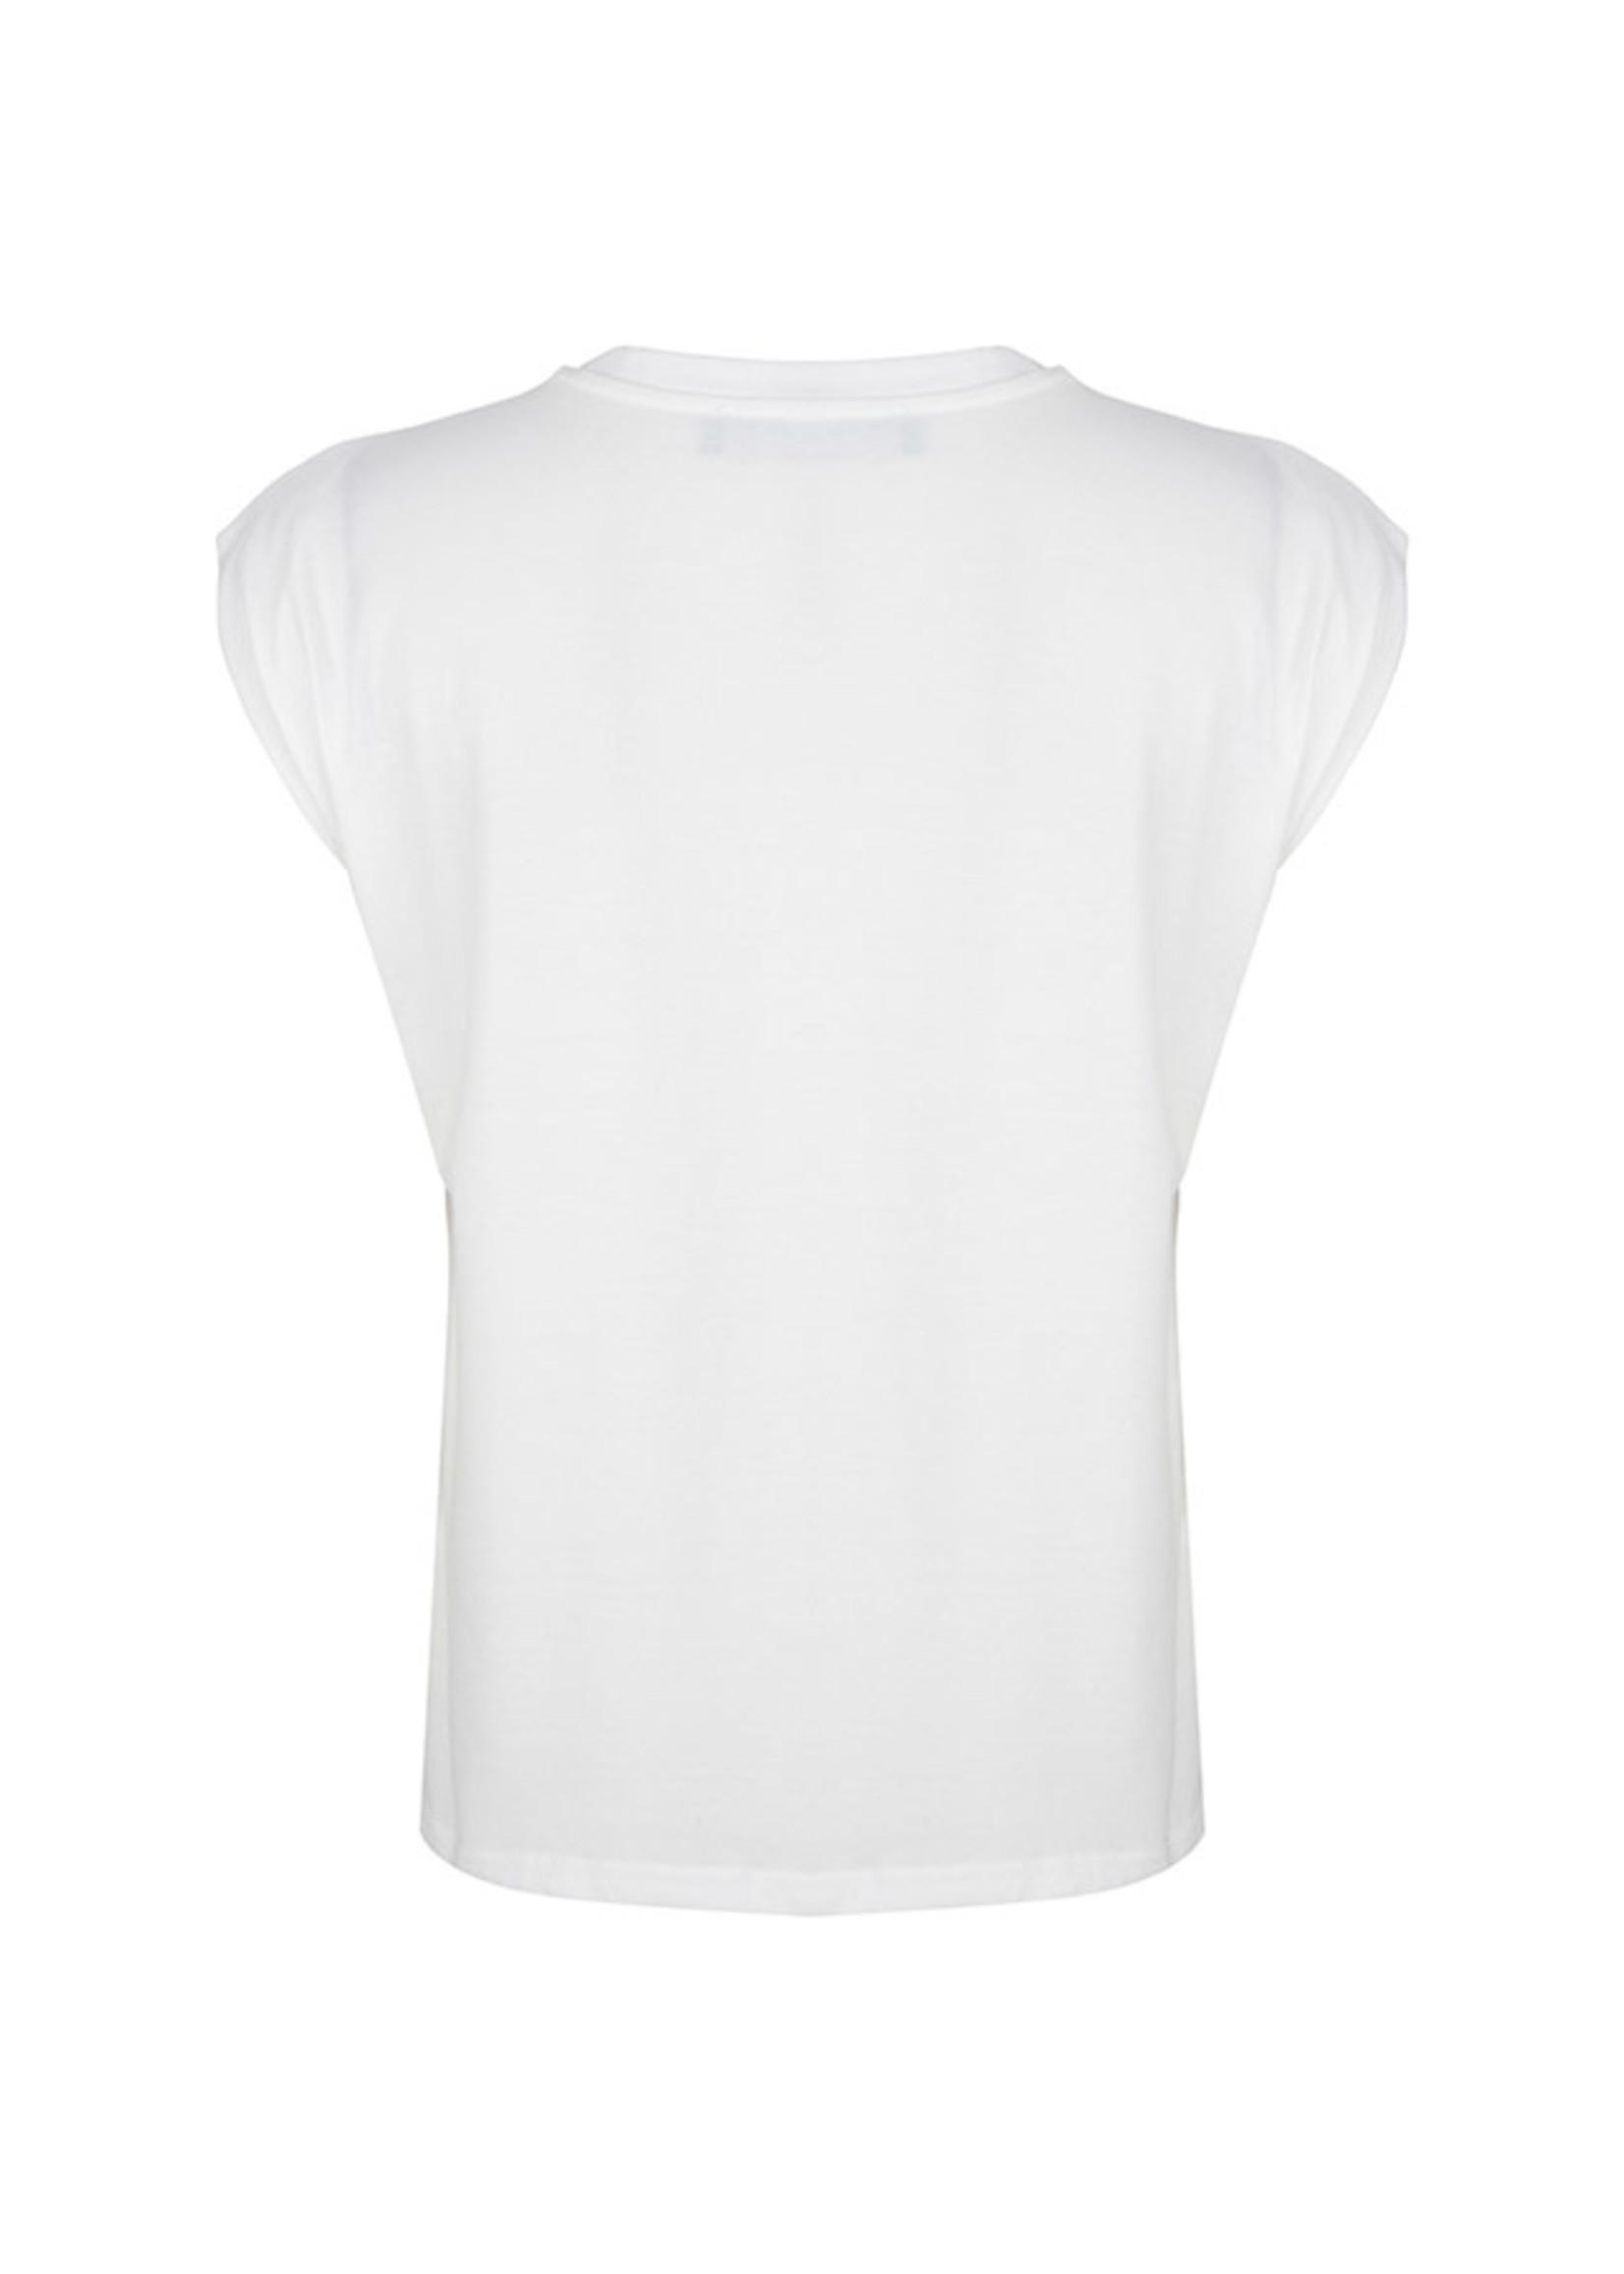 Lofty Manner White shirt on tour